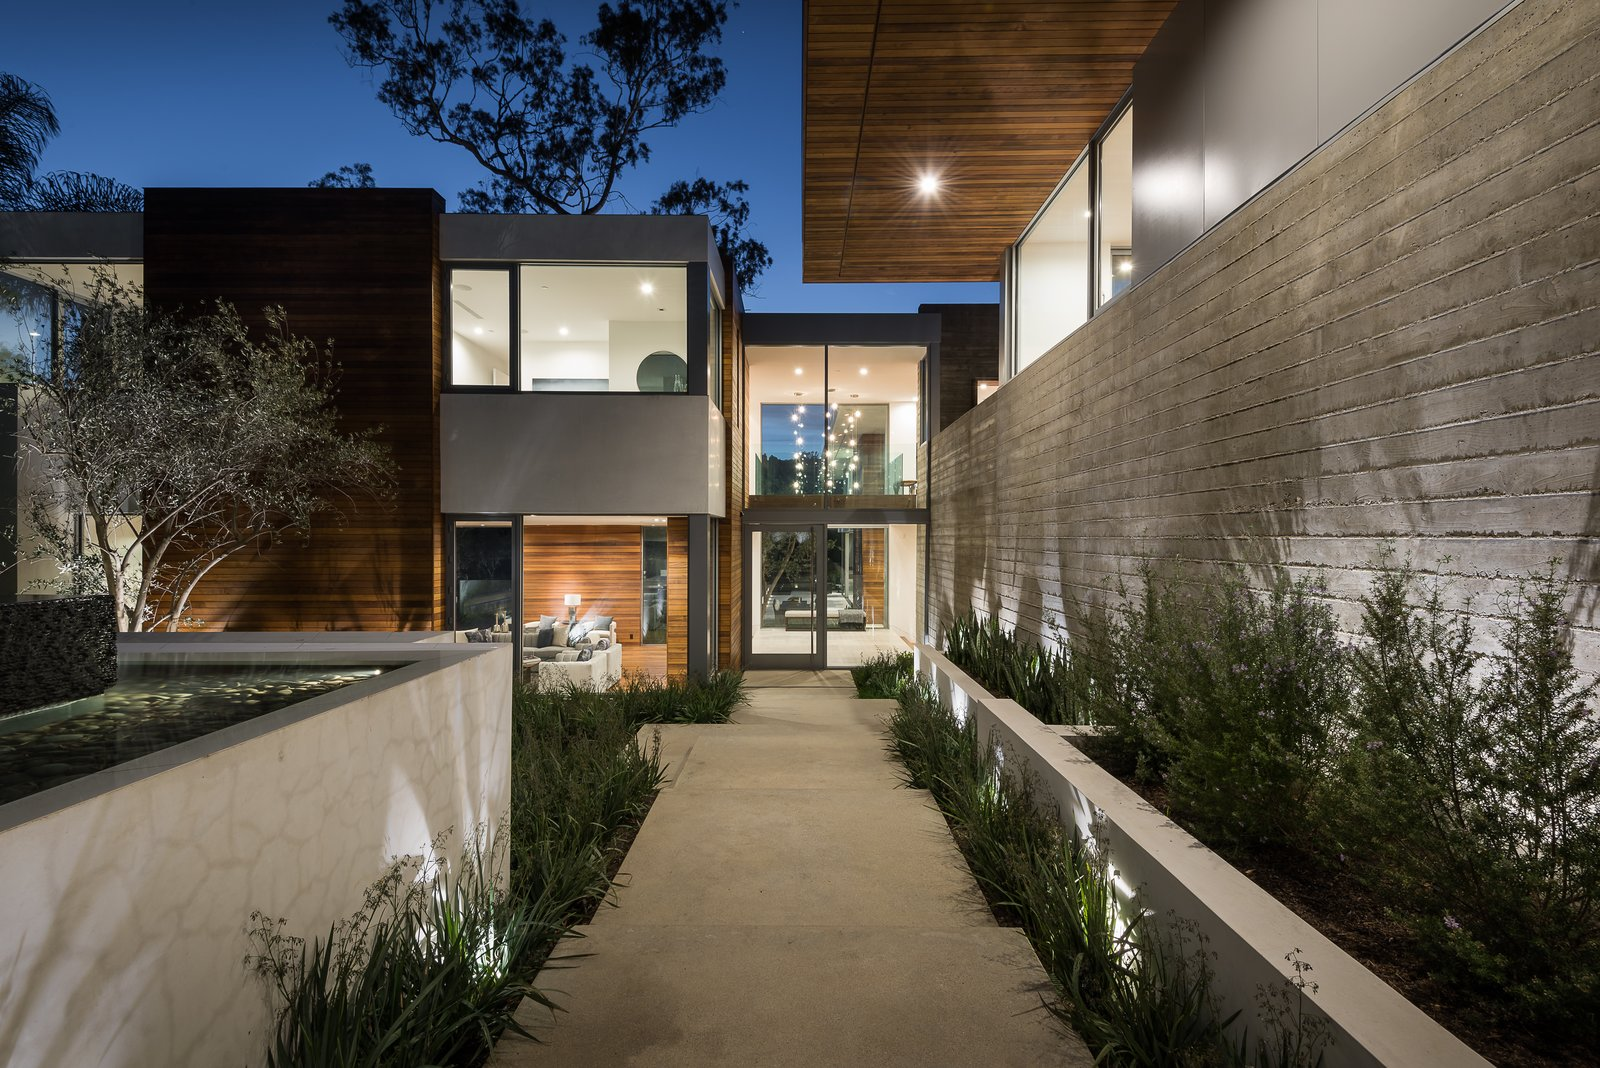 Outdoor, Walkways, Shrubs, Trees, Front Yard, Horizontal Fences, Wall, Landscape Lighting, Grass, Concrete Fences, Wall, Hardscapes, Wood Fences, Wall, and Gardens  Ravoli Drive Residence